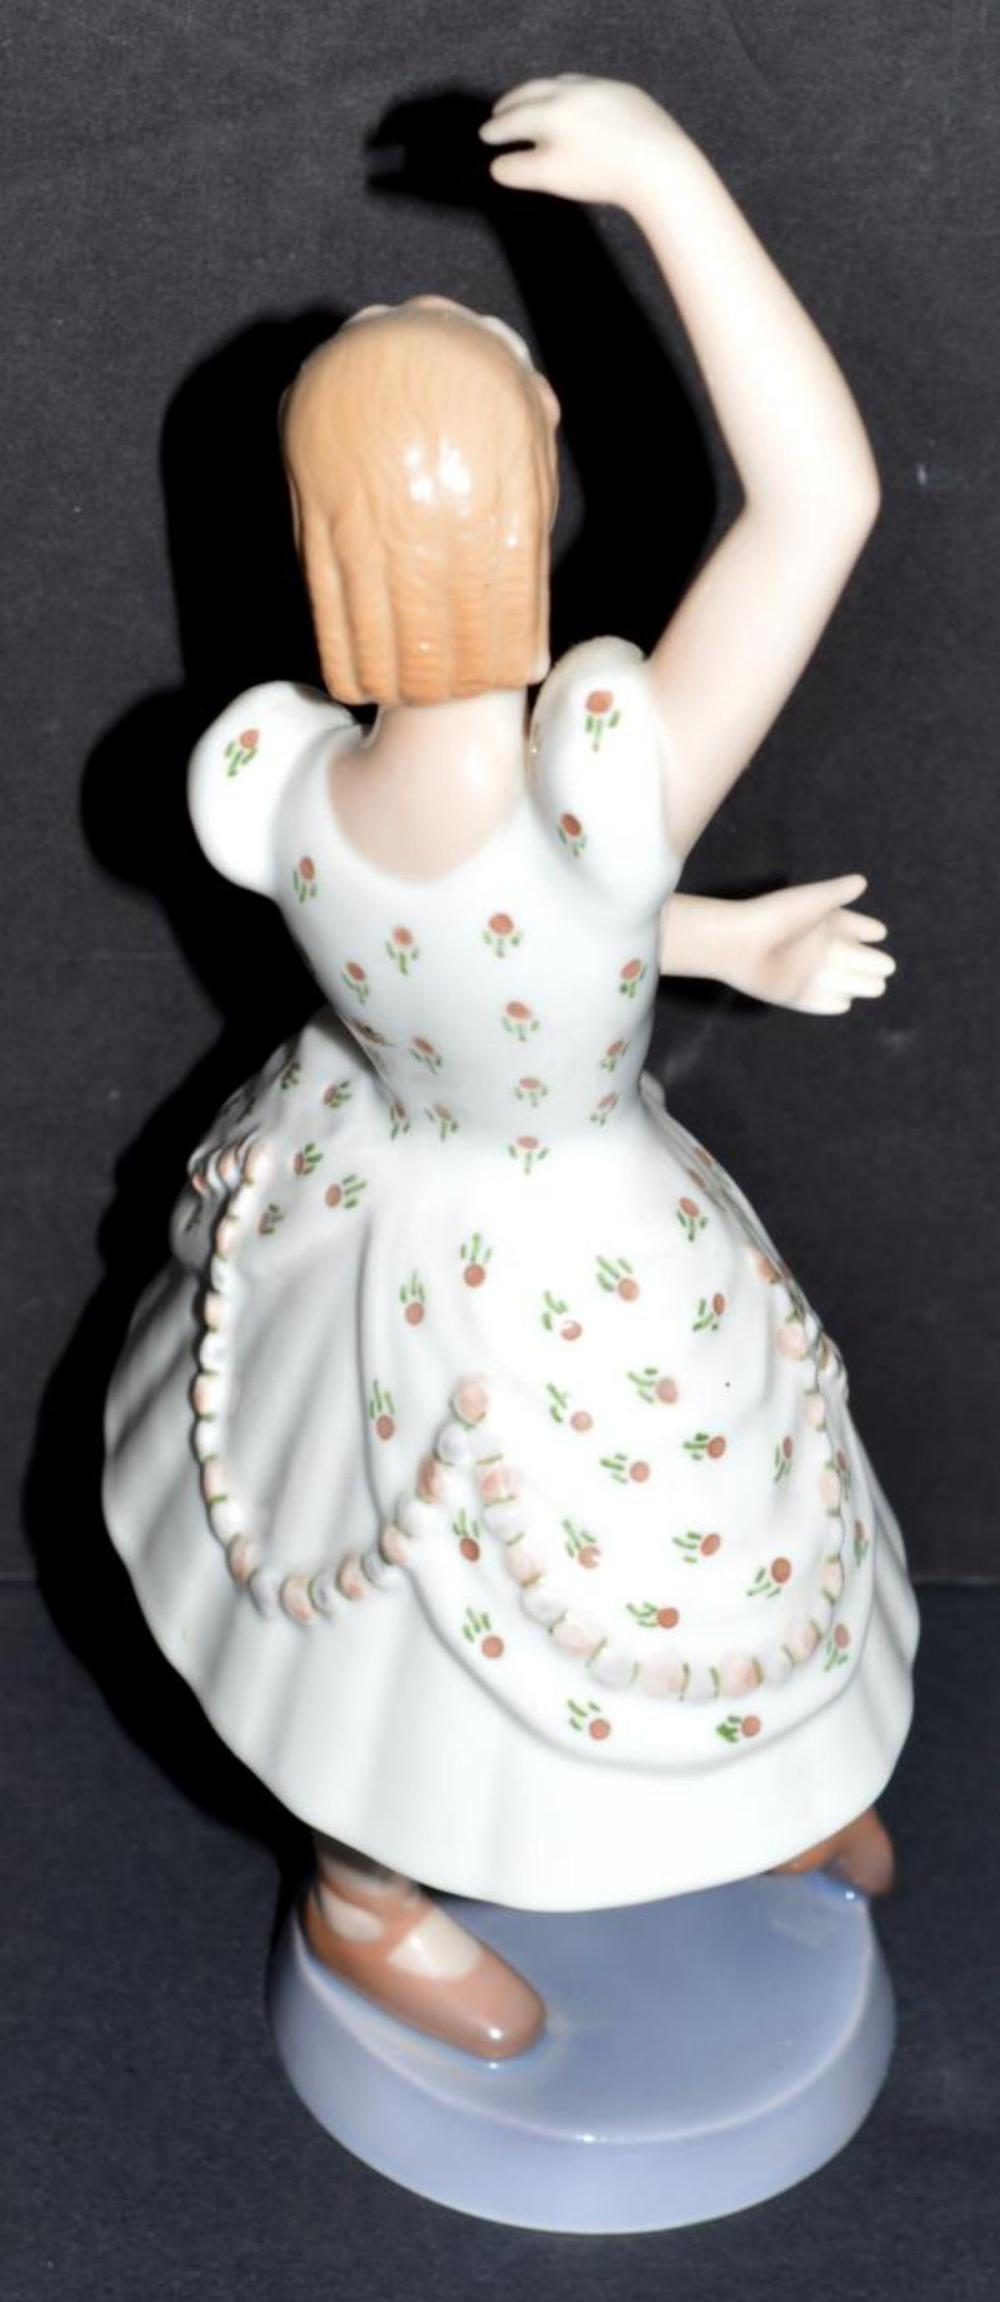 Lot 97: B&G Columbine Dancer #2355 Trivoli Series Figurine